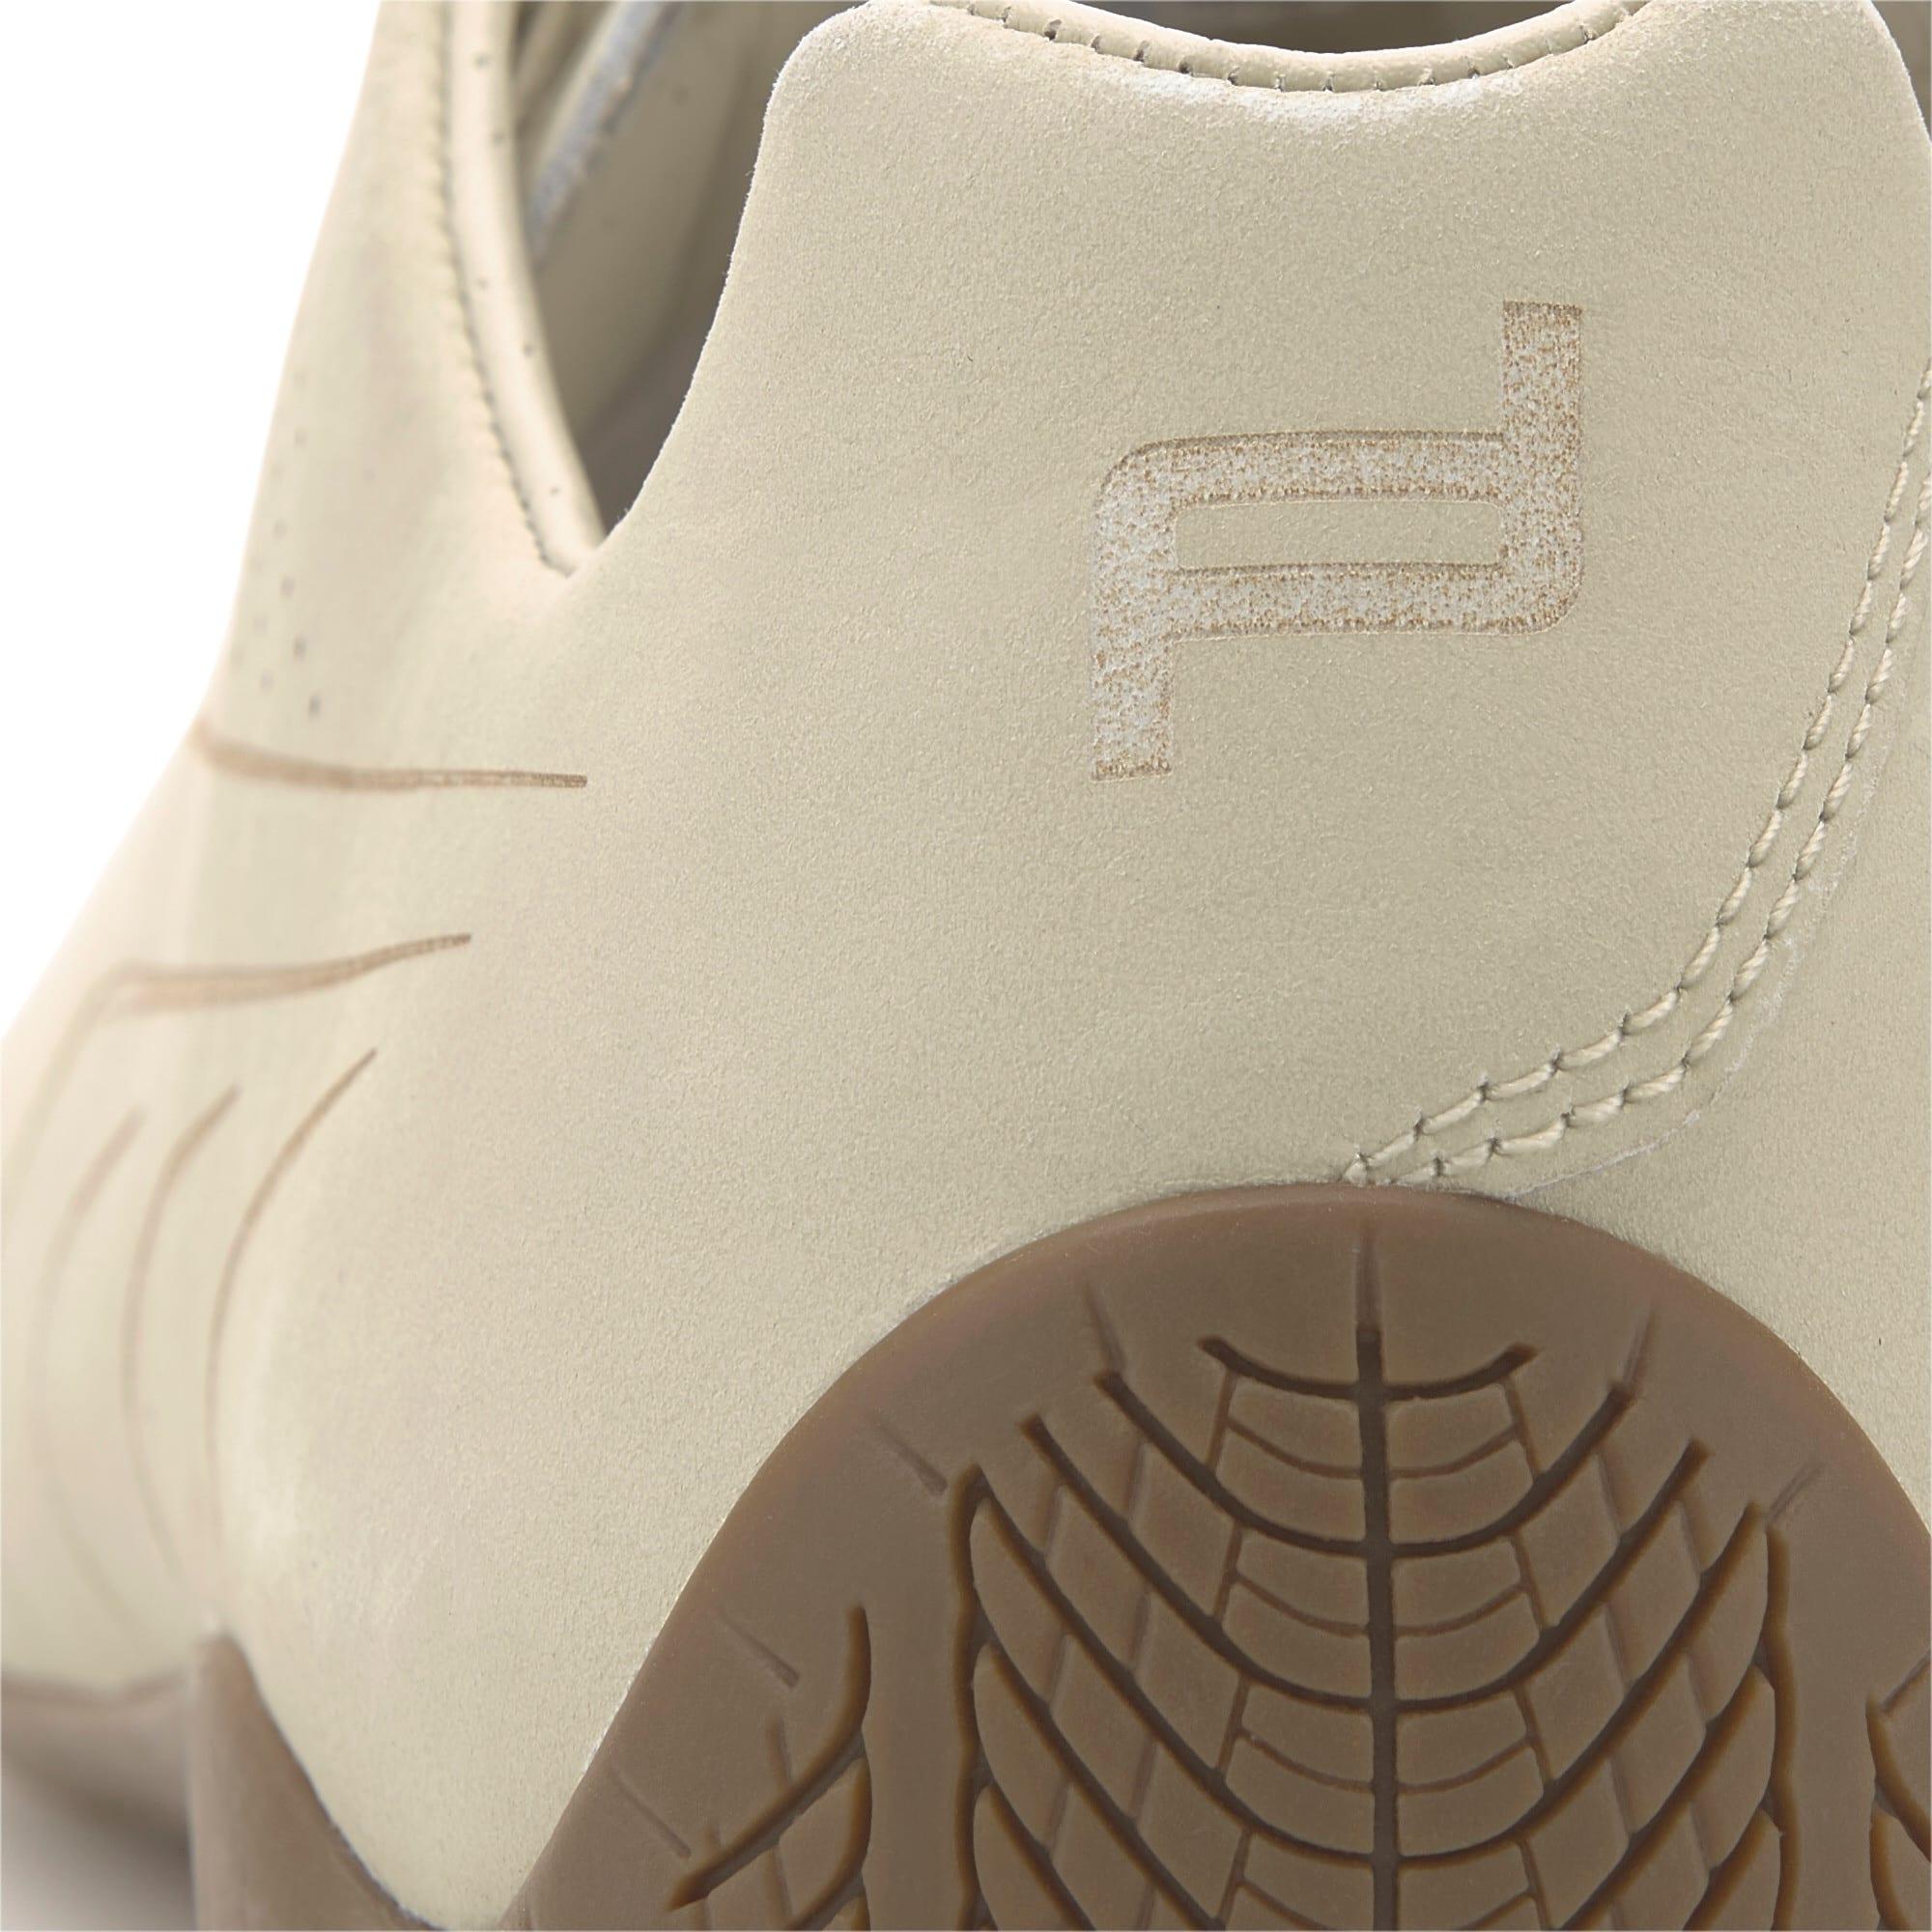 Thumbnail 7 of Basket Porsche Design Speedcat Lux pour homme, Overcast-Overcast, medium